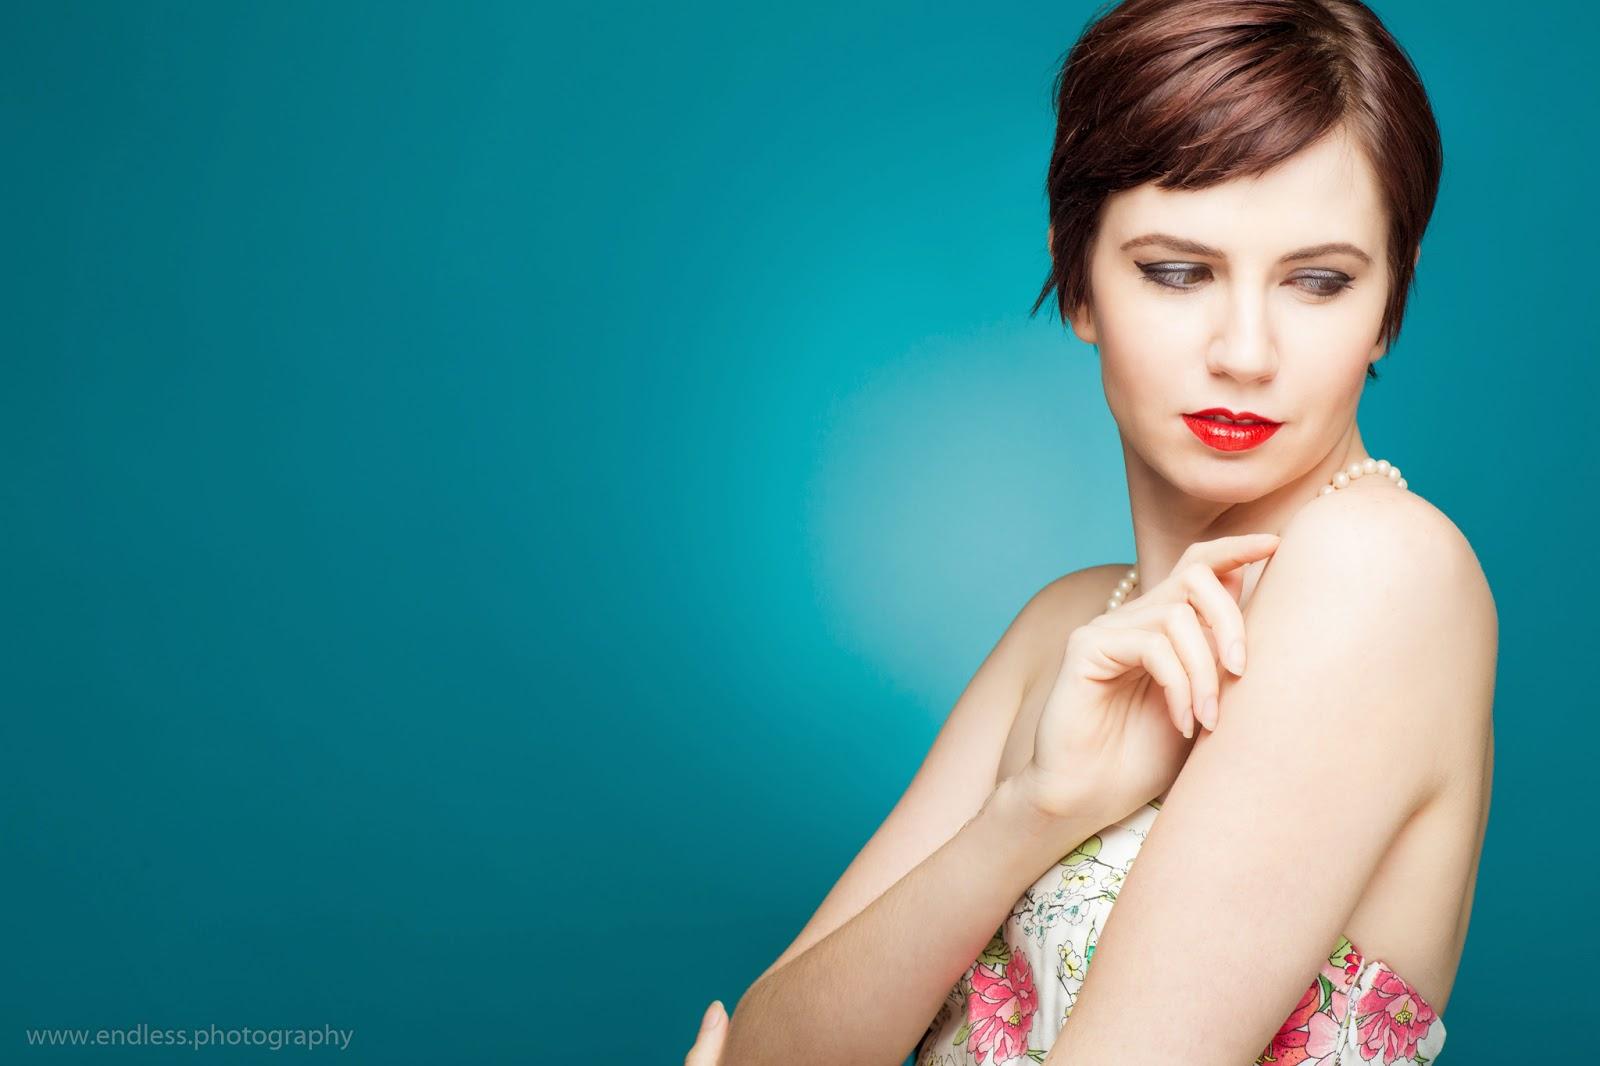 Logan Photographers, Portrait Photography, Logan, Utah, Photography, Photographer, Studio, Model